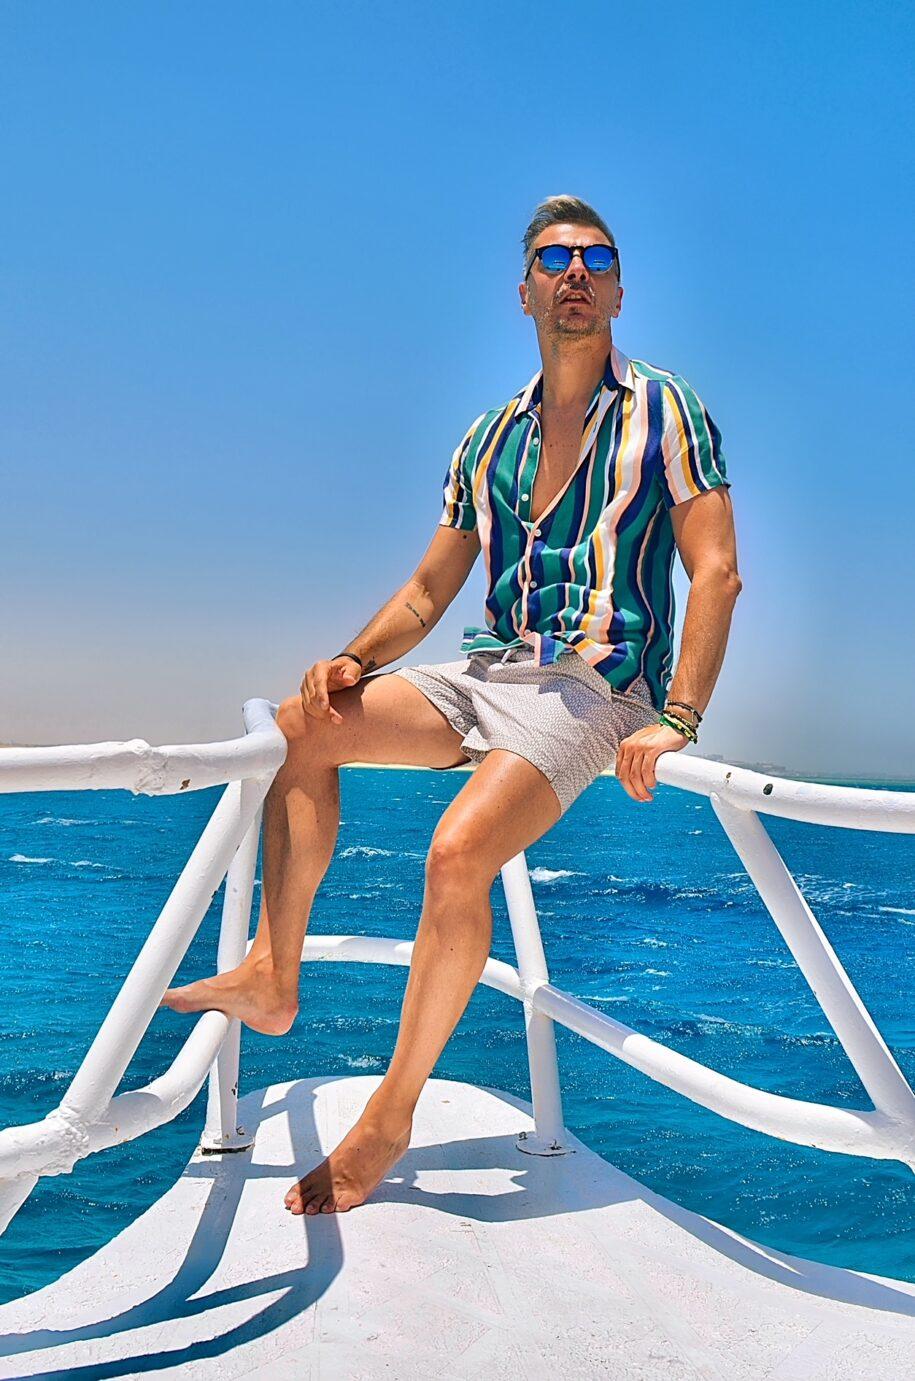 Ovidiu Muresanu Boat Red Sea